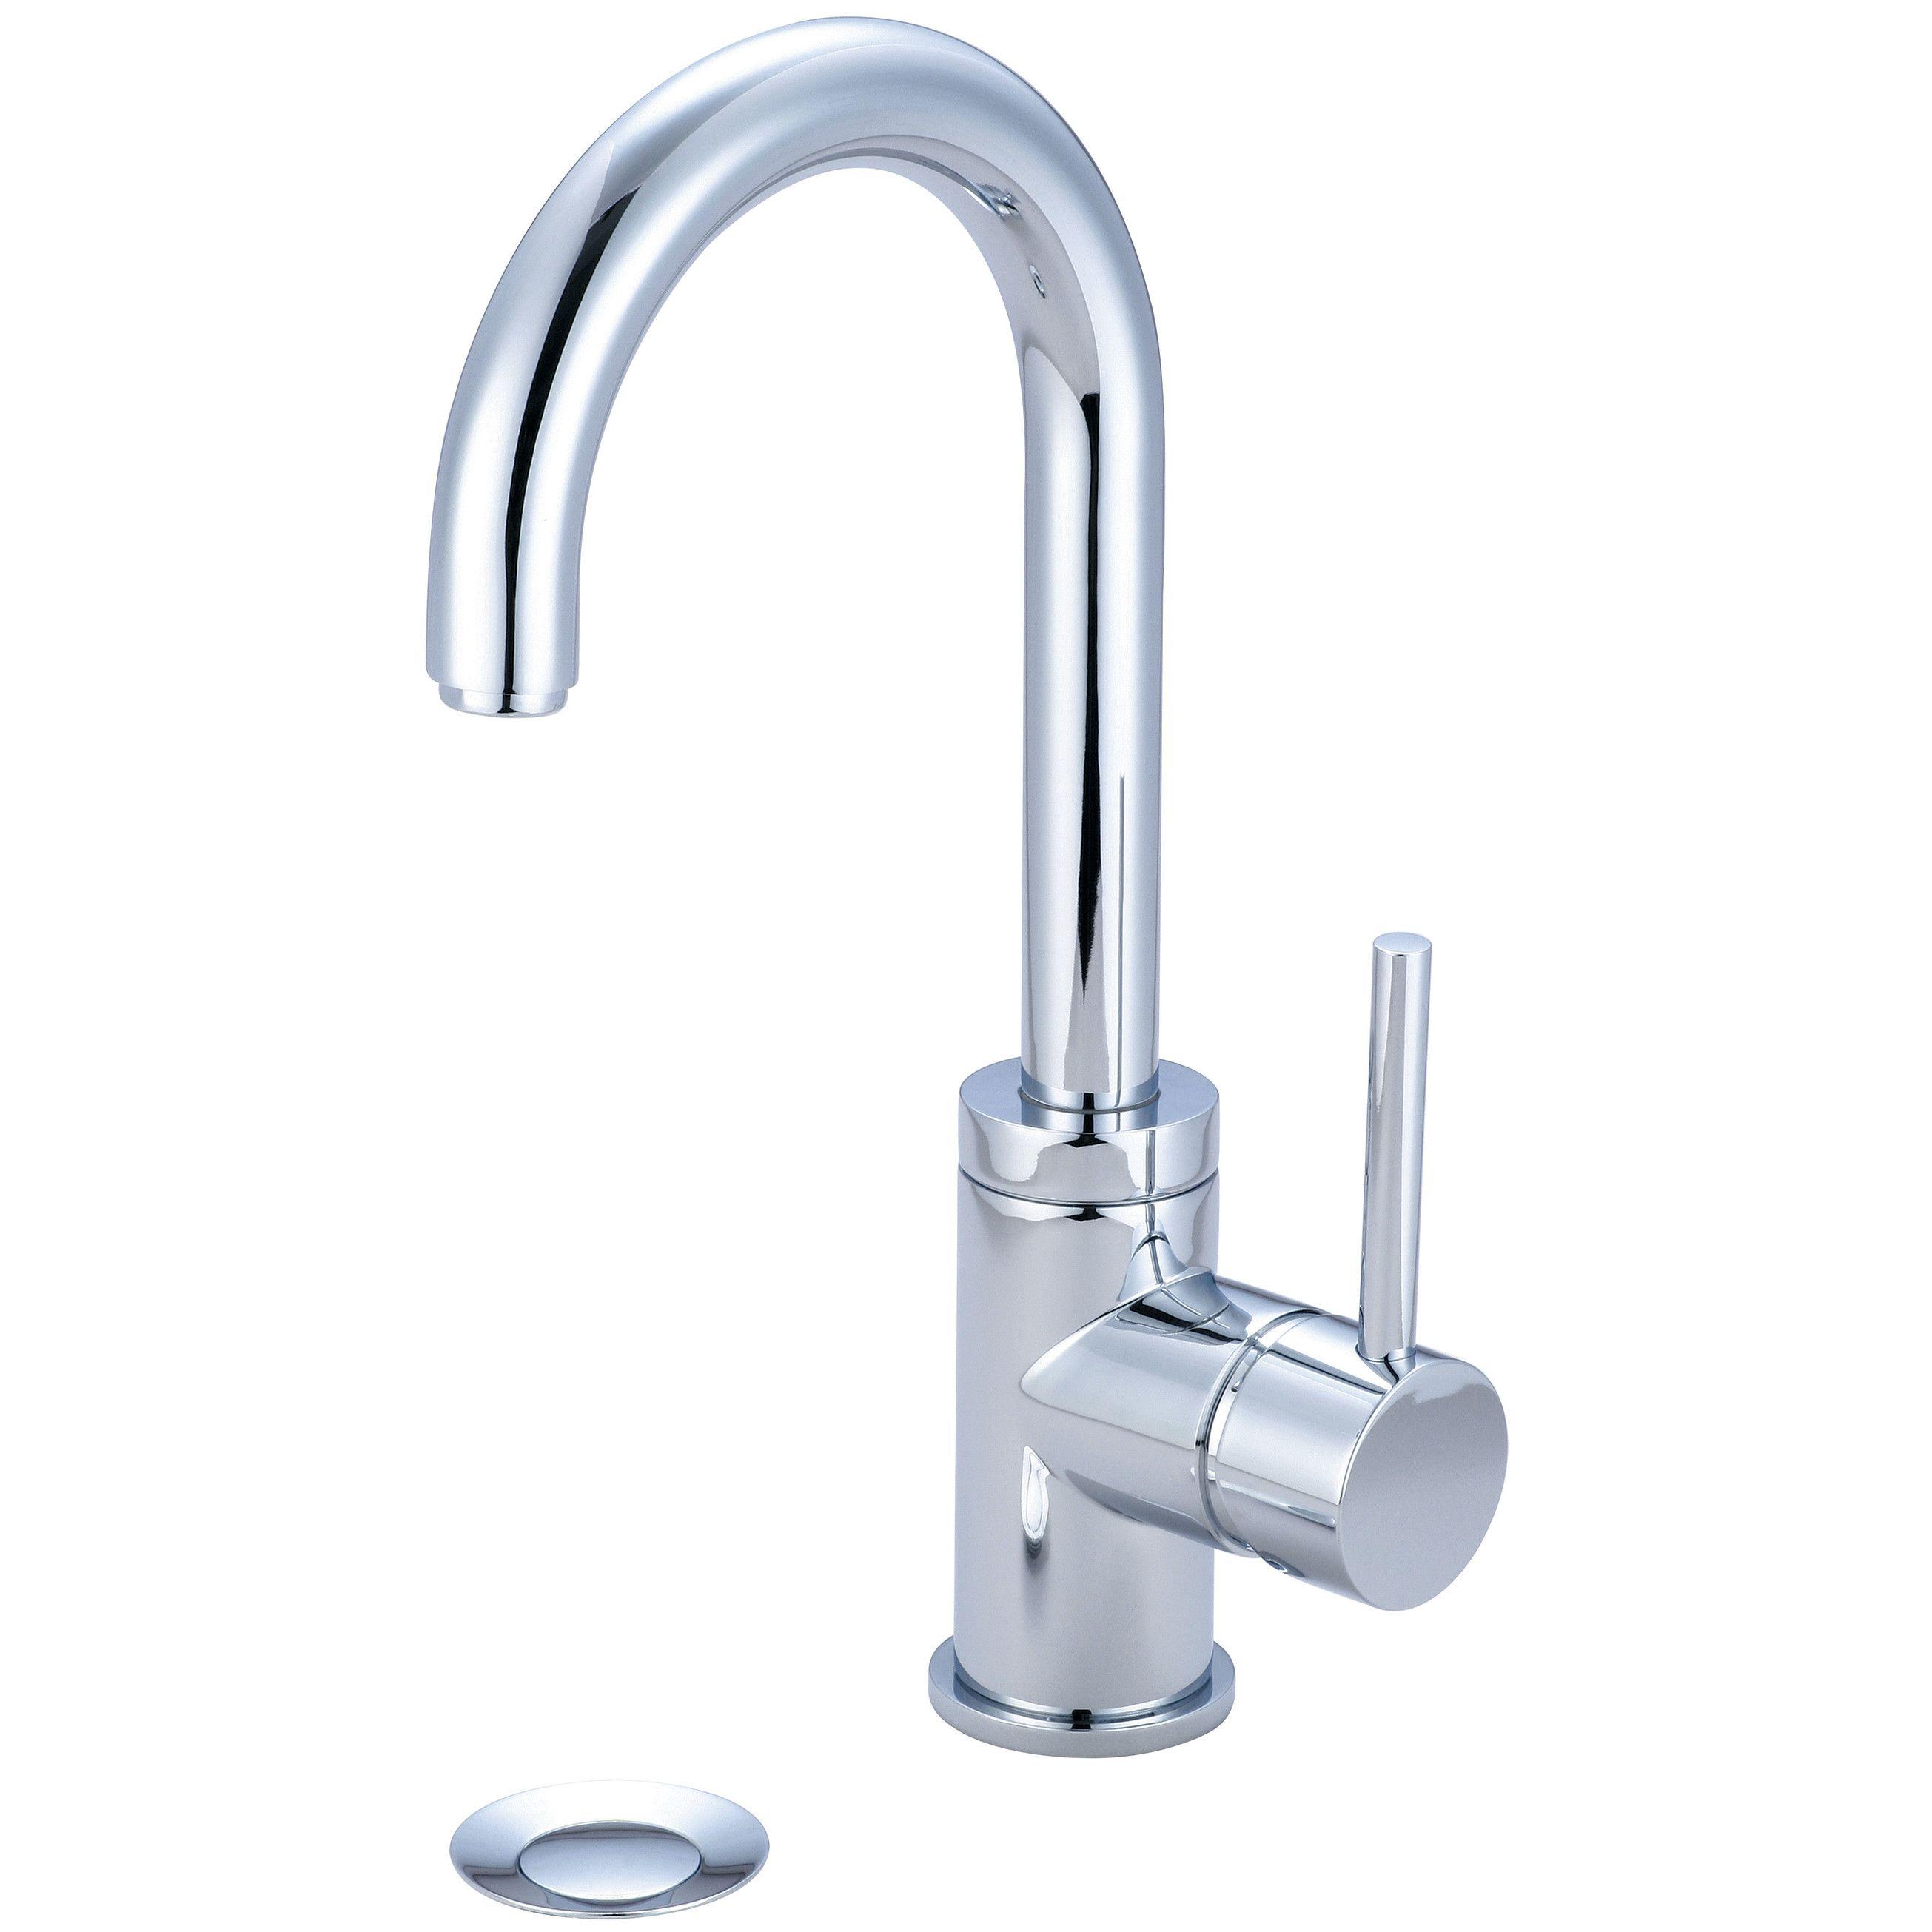 Bathroom Faucet Reviews pioneer motegi single handle deck mounted bathroom faucet